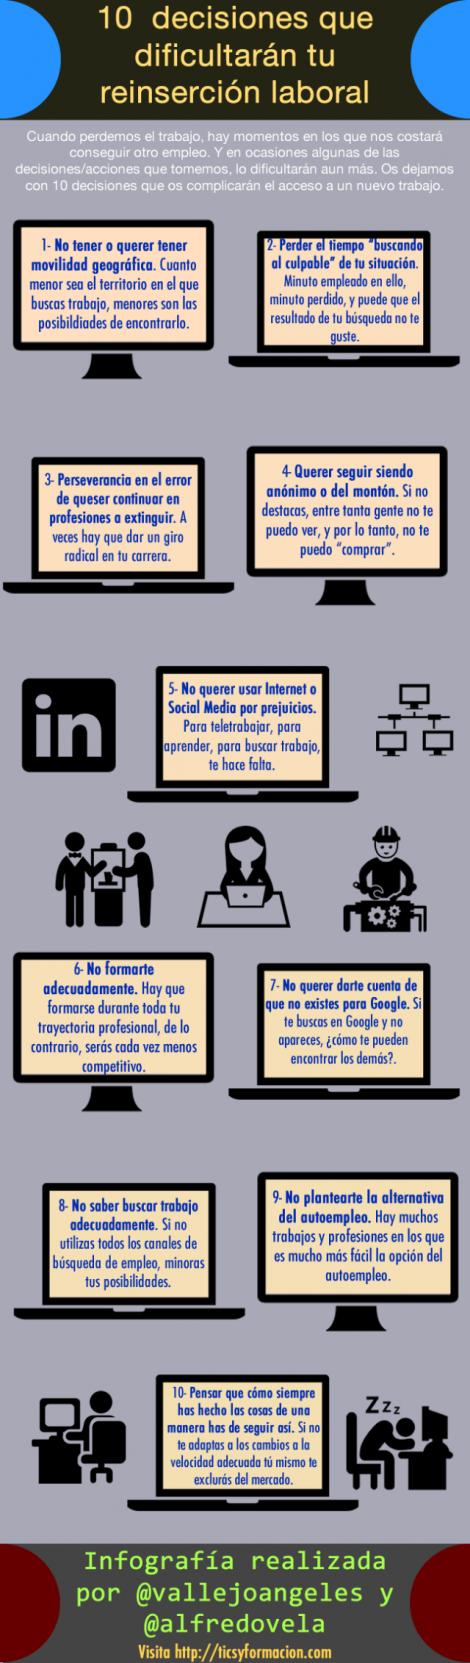 infografia_10_decisiones_que_complicaran_tu_insercion_laboral-fw